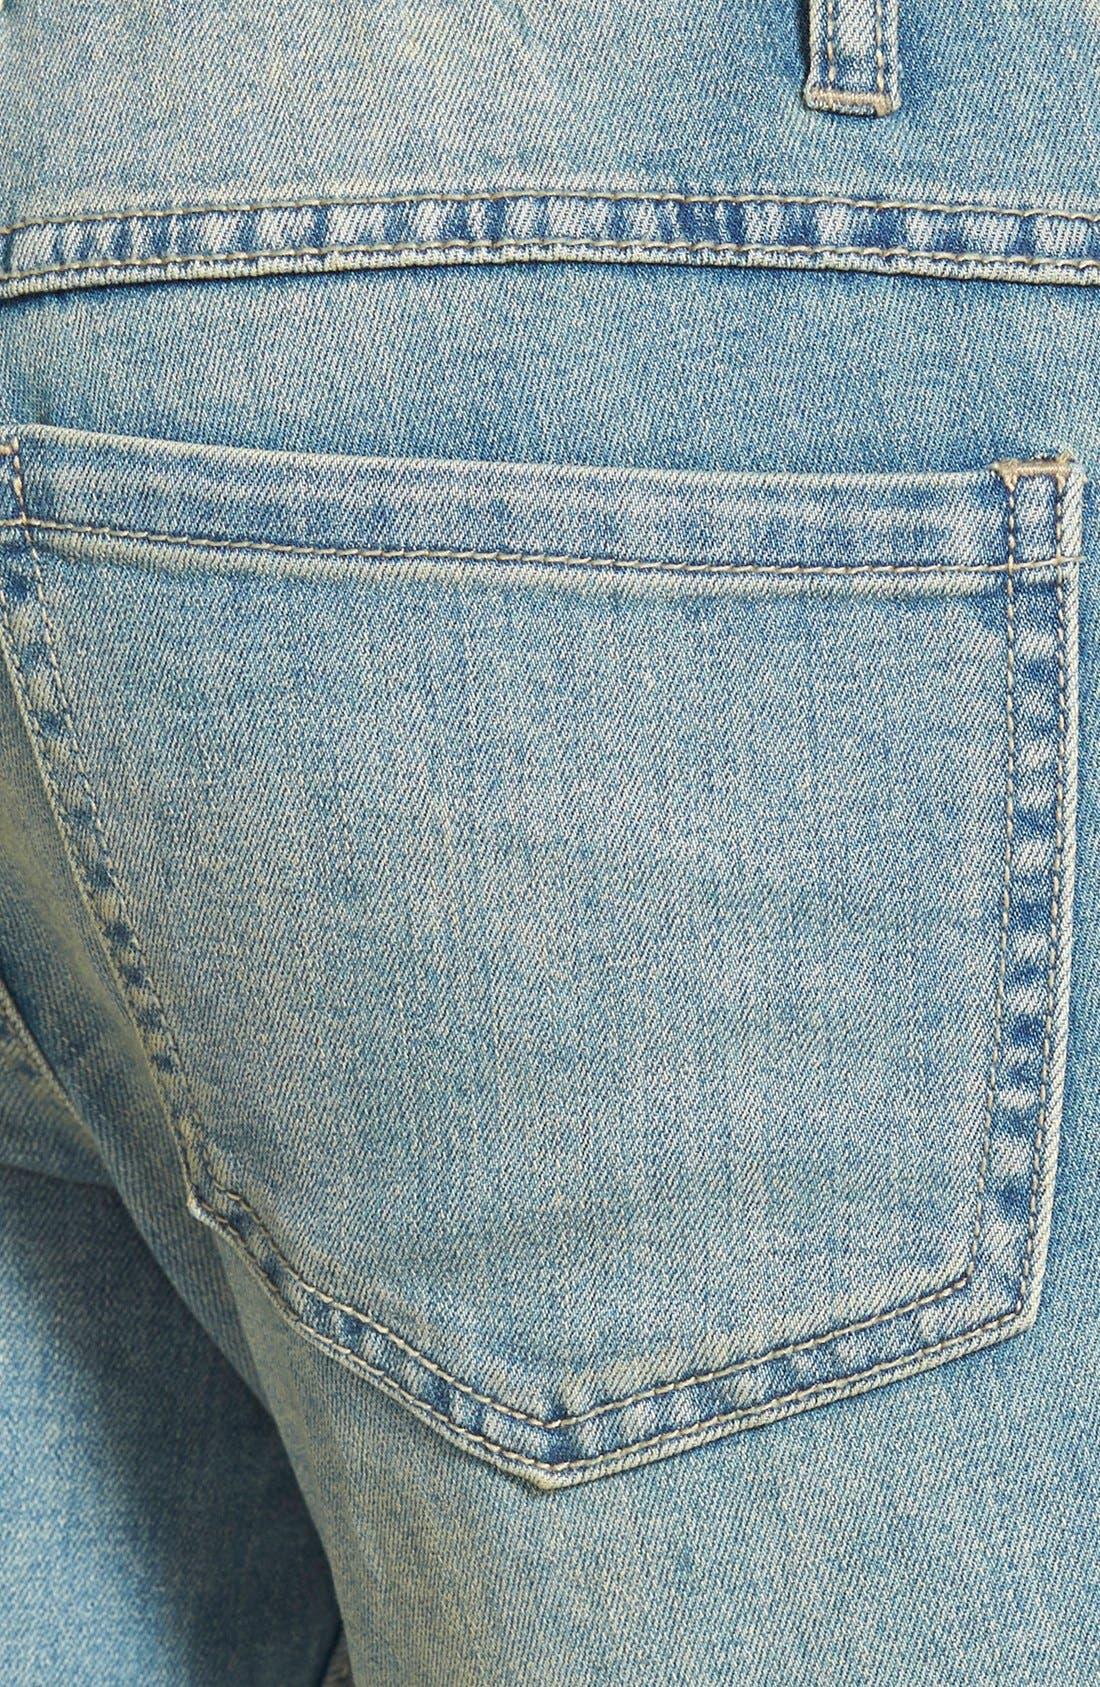 Alternate Image 3  - Free People Destroyed Skinny Jeans (Sitka)